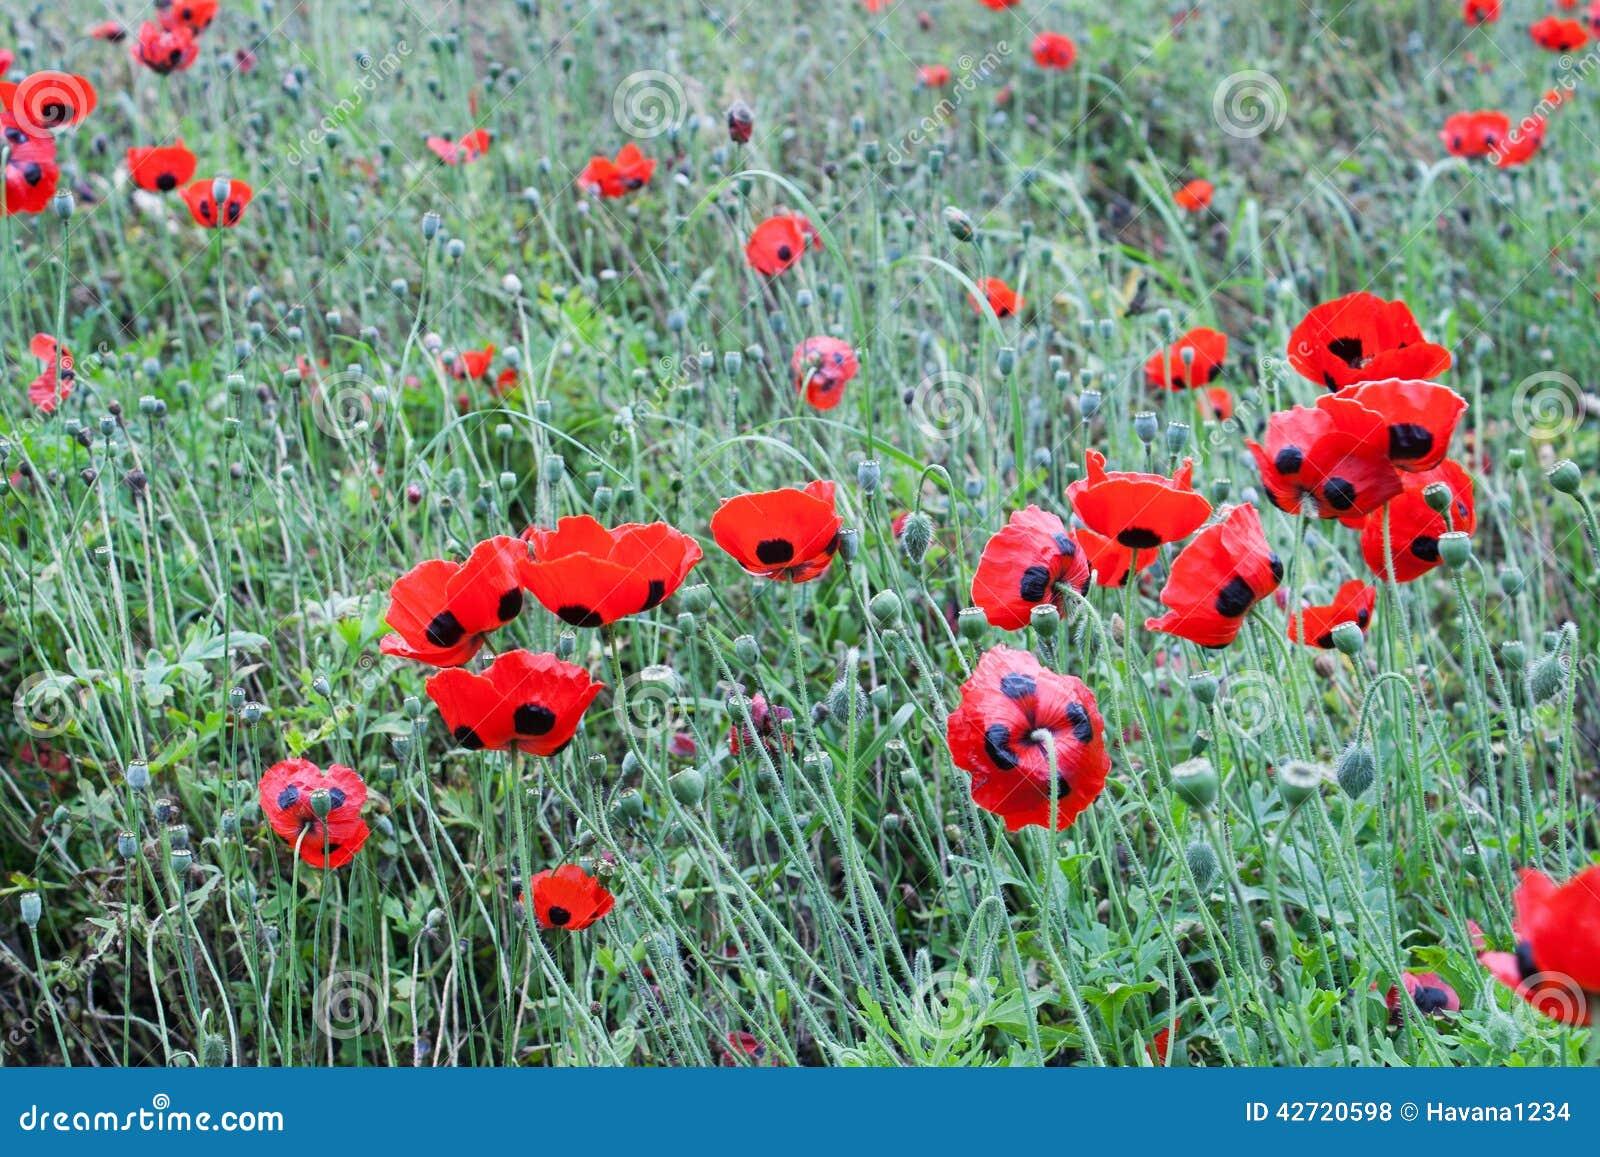 The Poppy Or Poppies World War One In Belgium Flanders Fields Stock